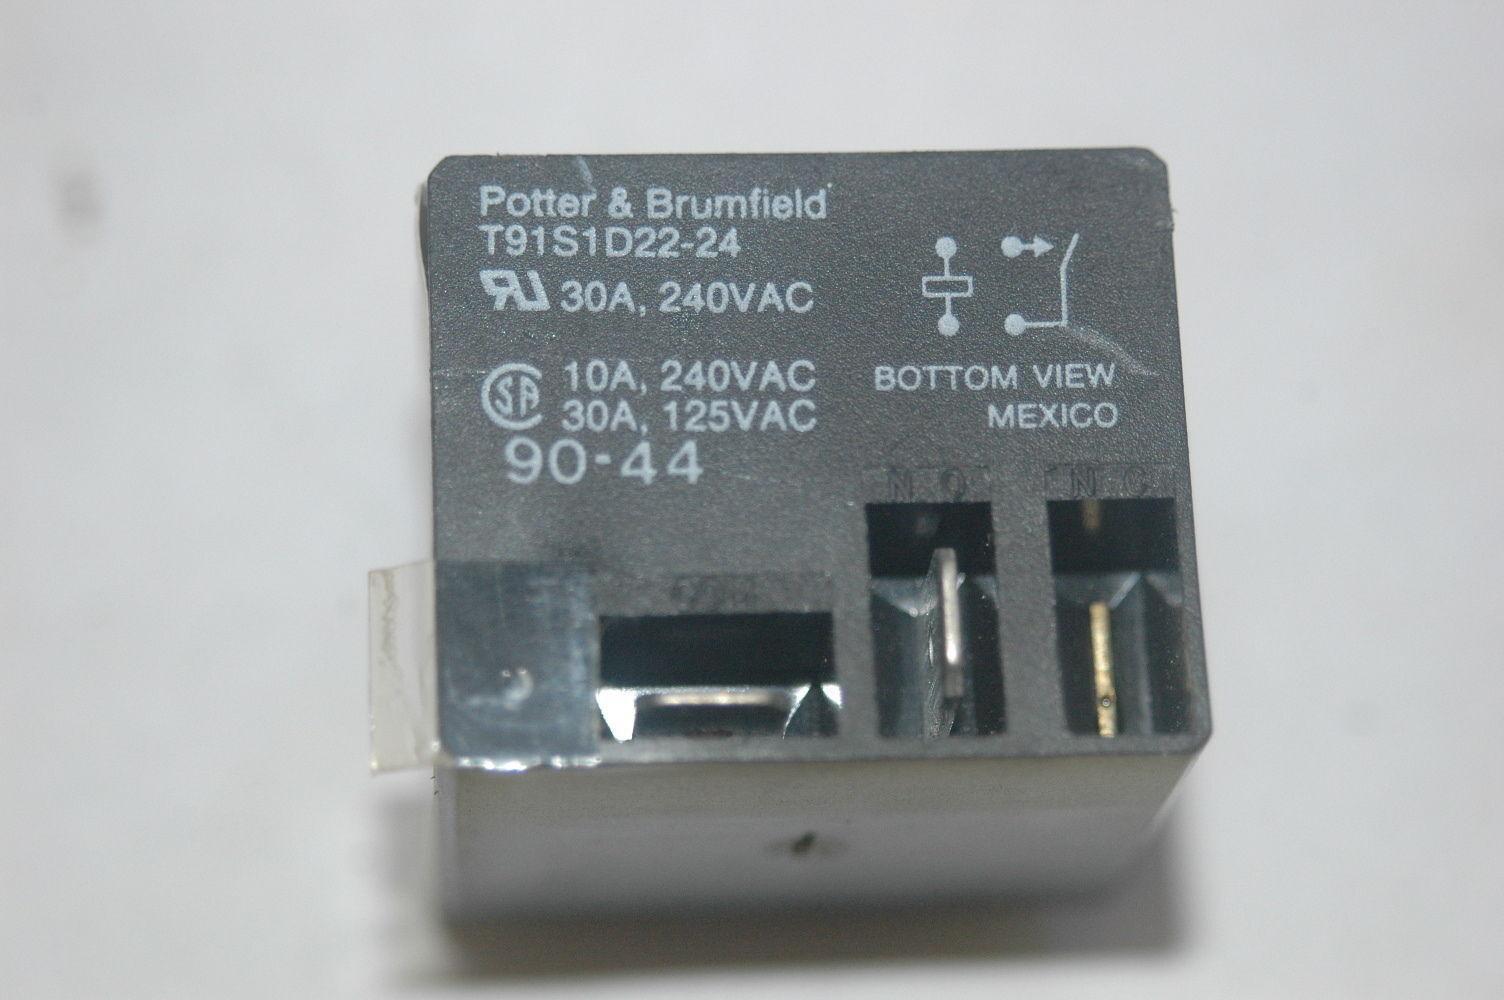 hight resolution of potter brumfield t91s1d22 24 24vdc power relay spst 30a 240vac ebay